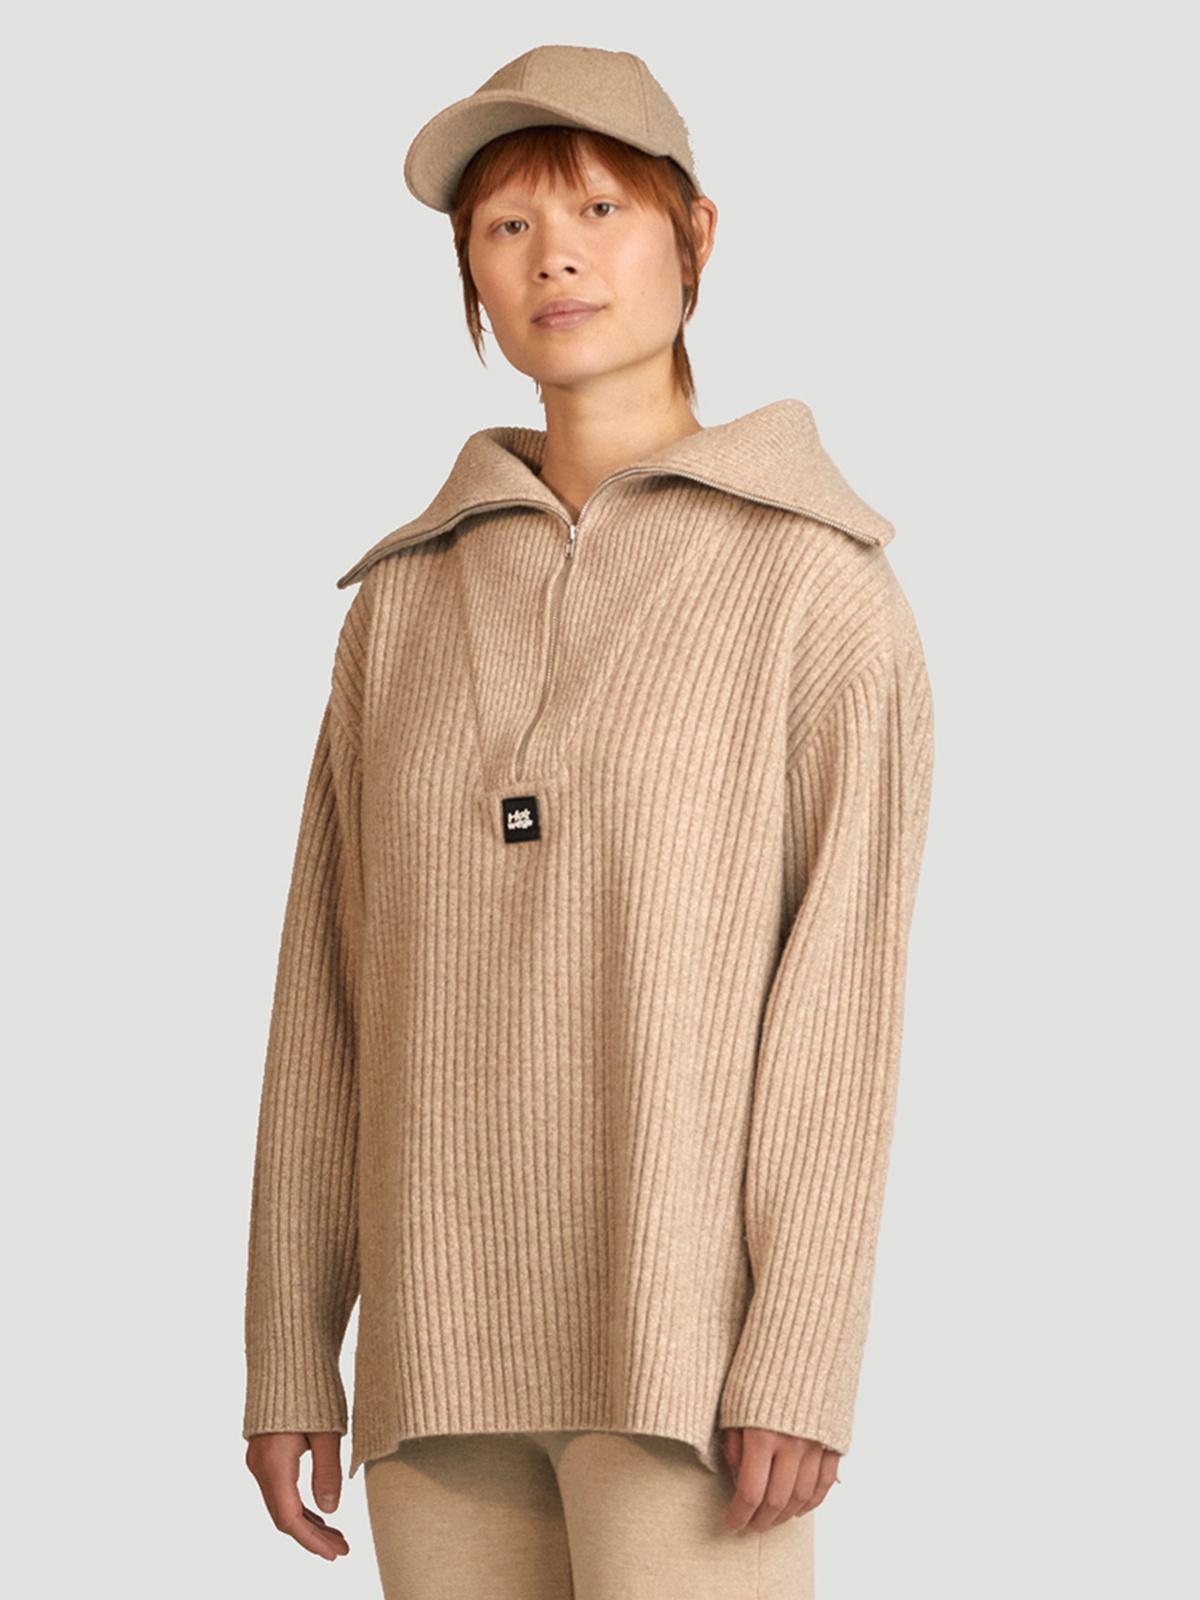 React Knit Sweater  Sand 3